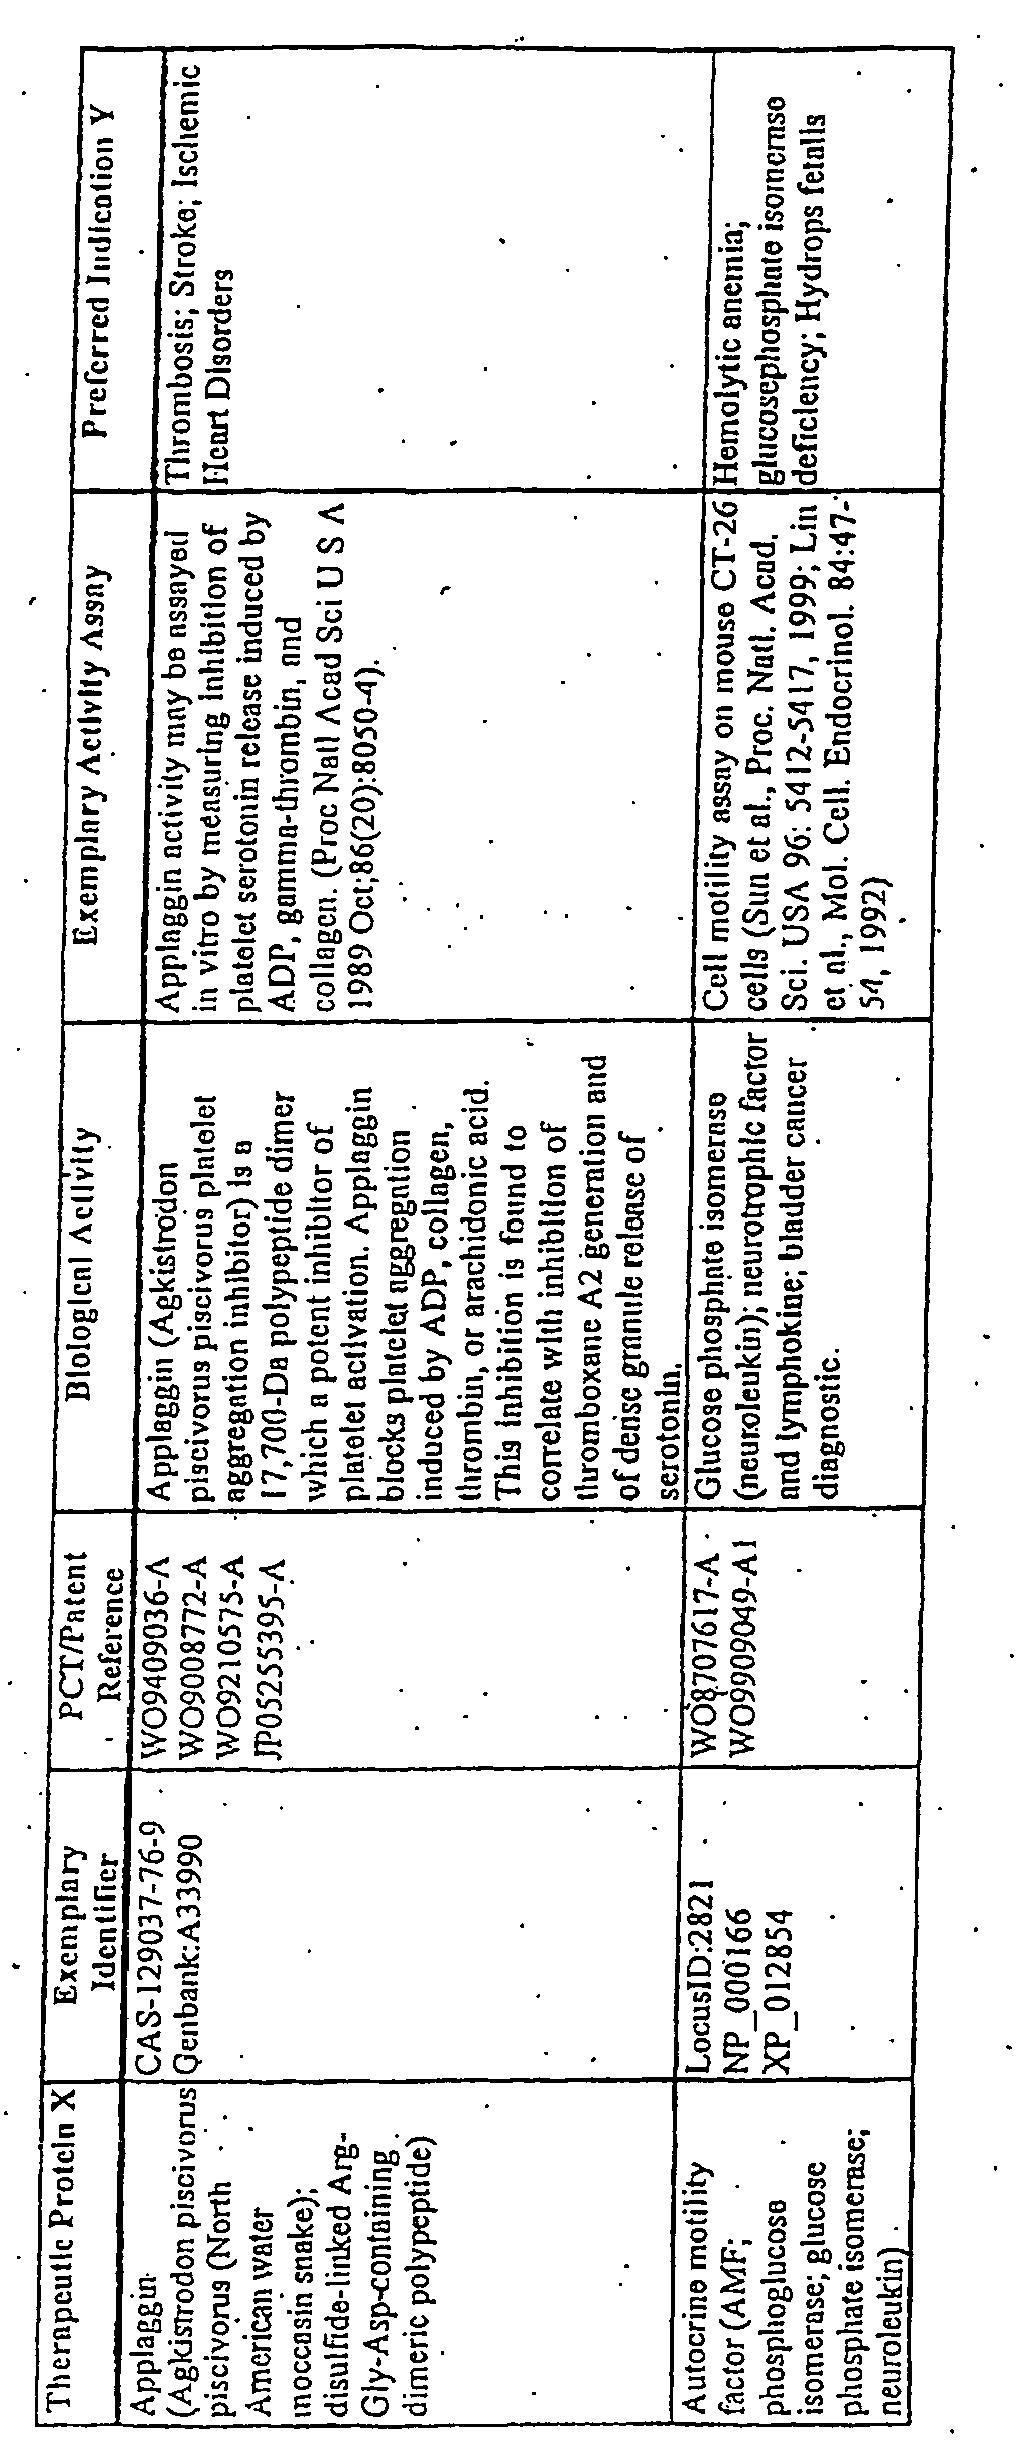 Albumin fusion proteins Patent 2311872